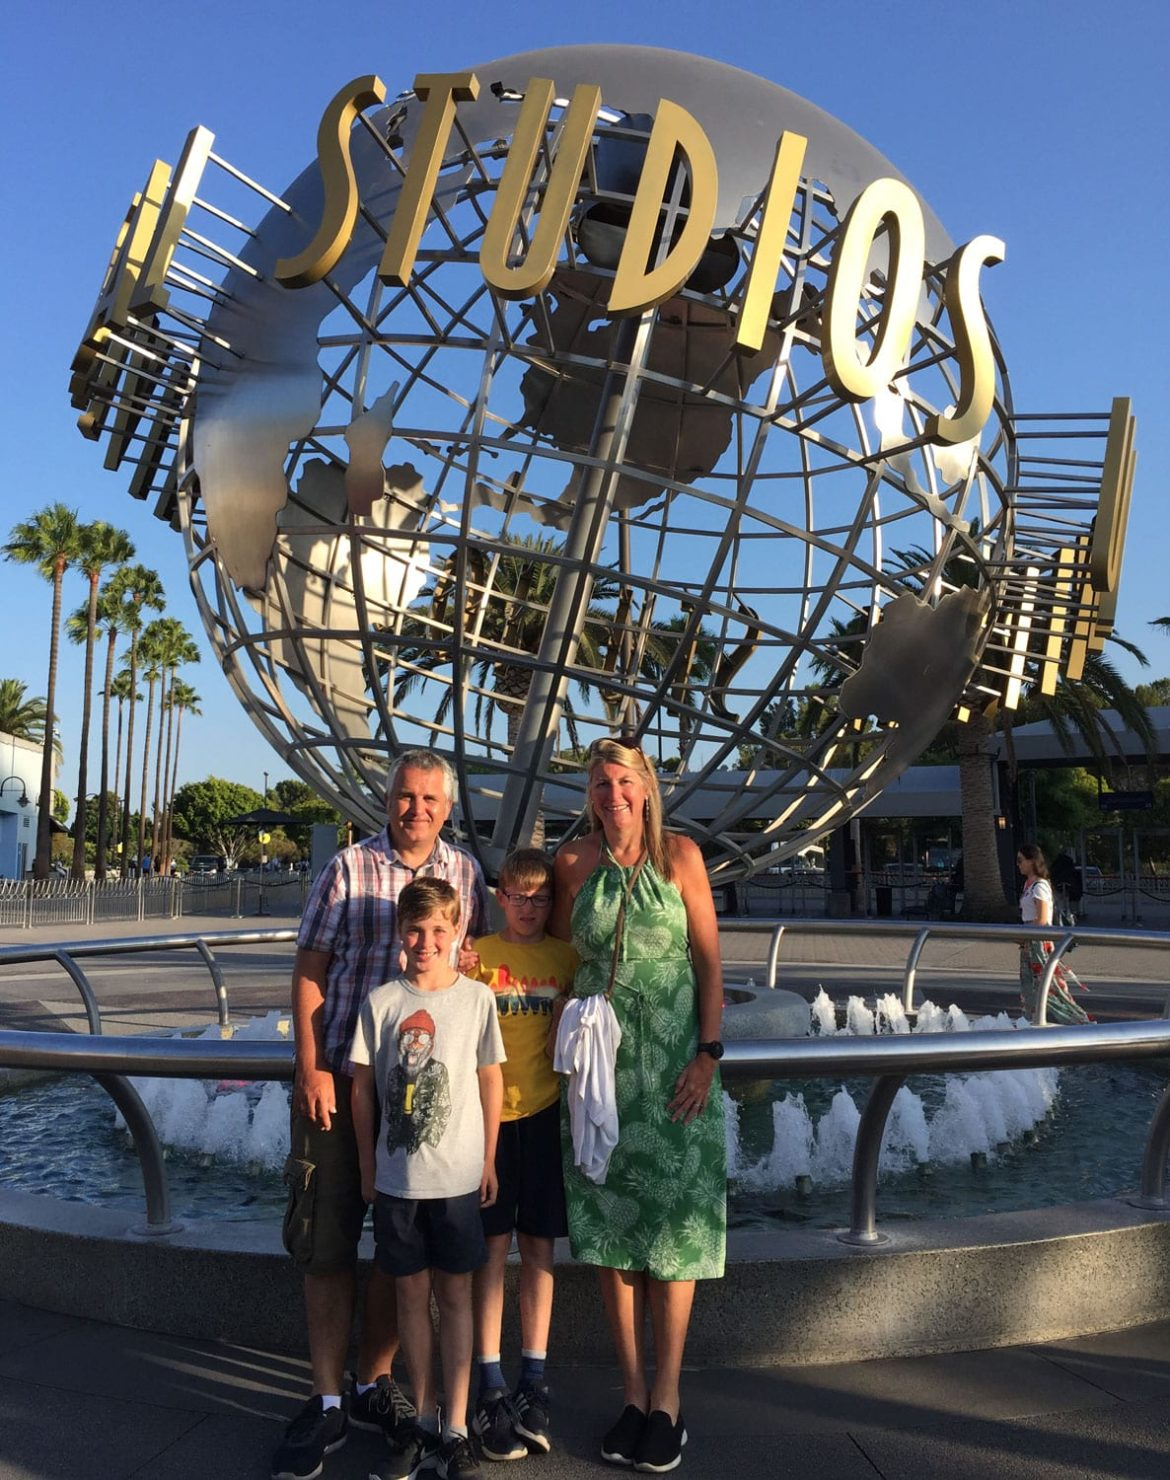 Entrance to Universal Studios, LA